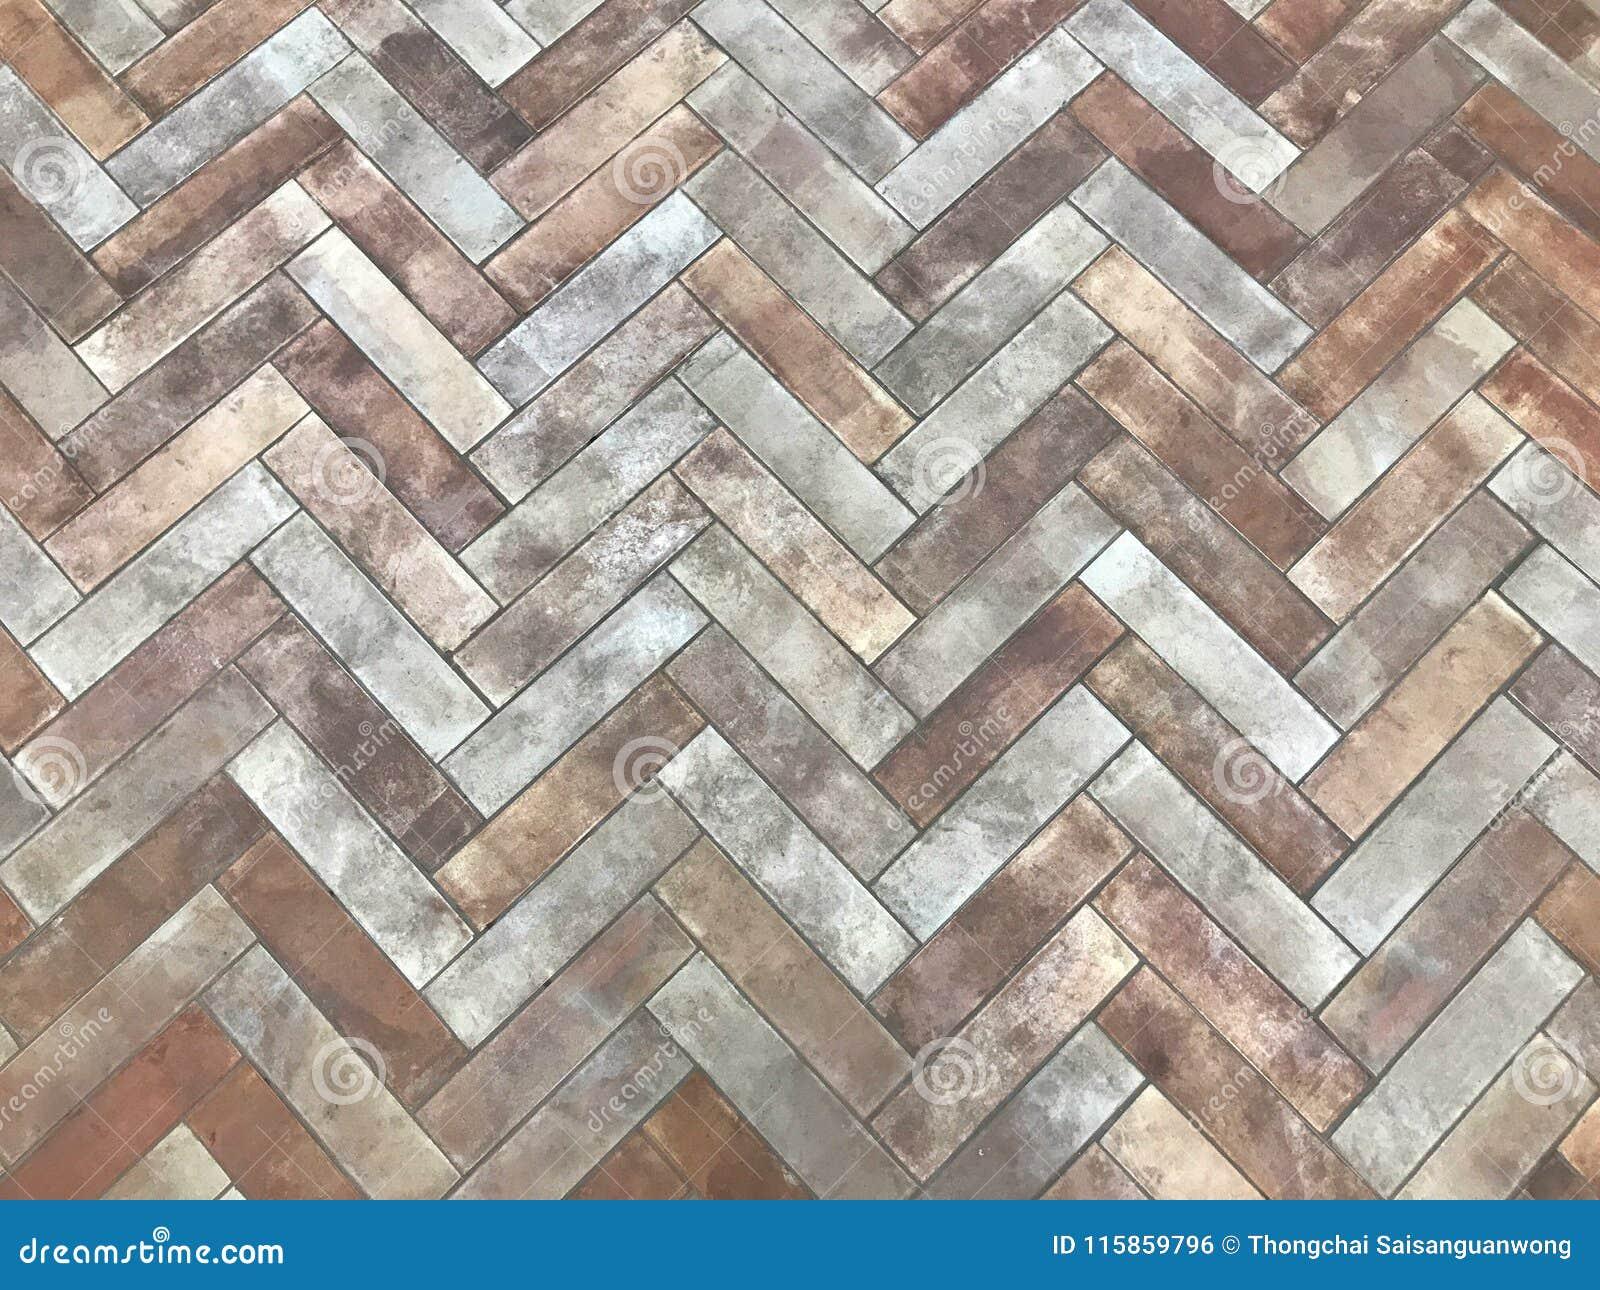 Patterns Of Paths Or Floors From The Arrangement Bricks Floor Tiles